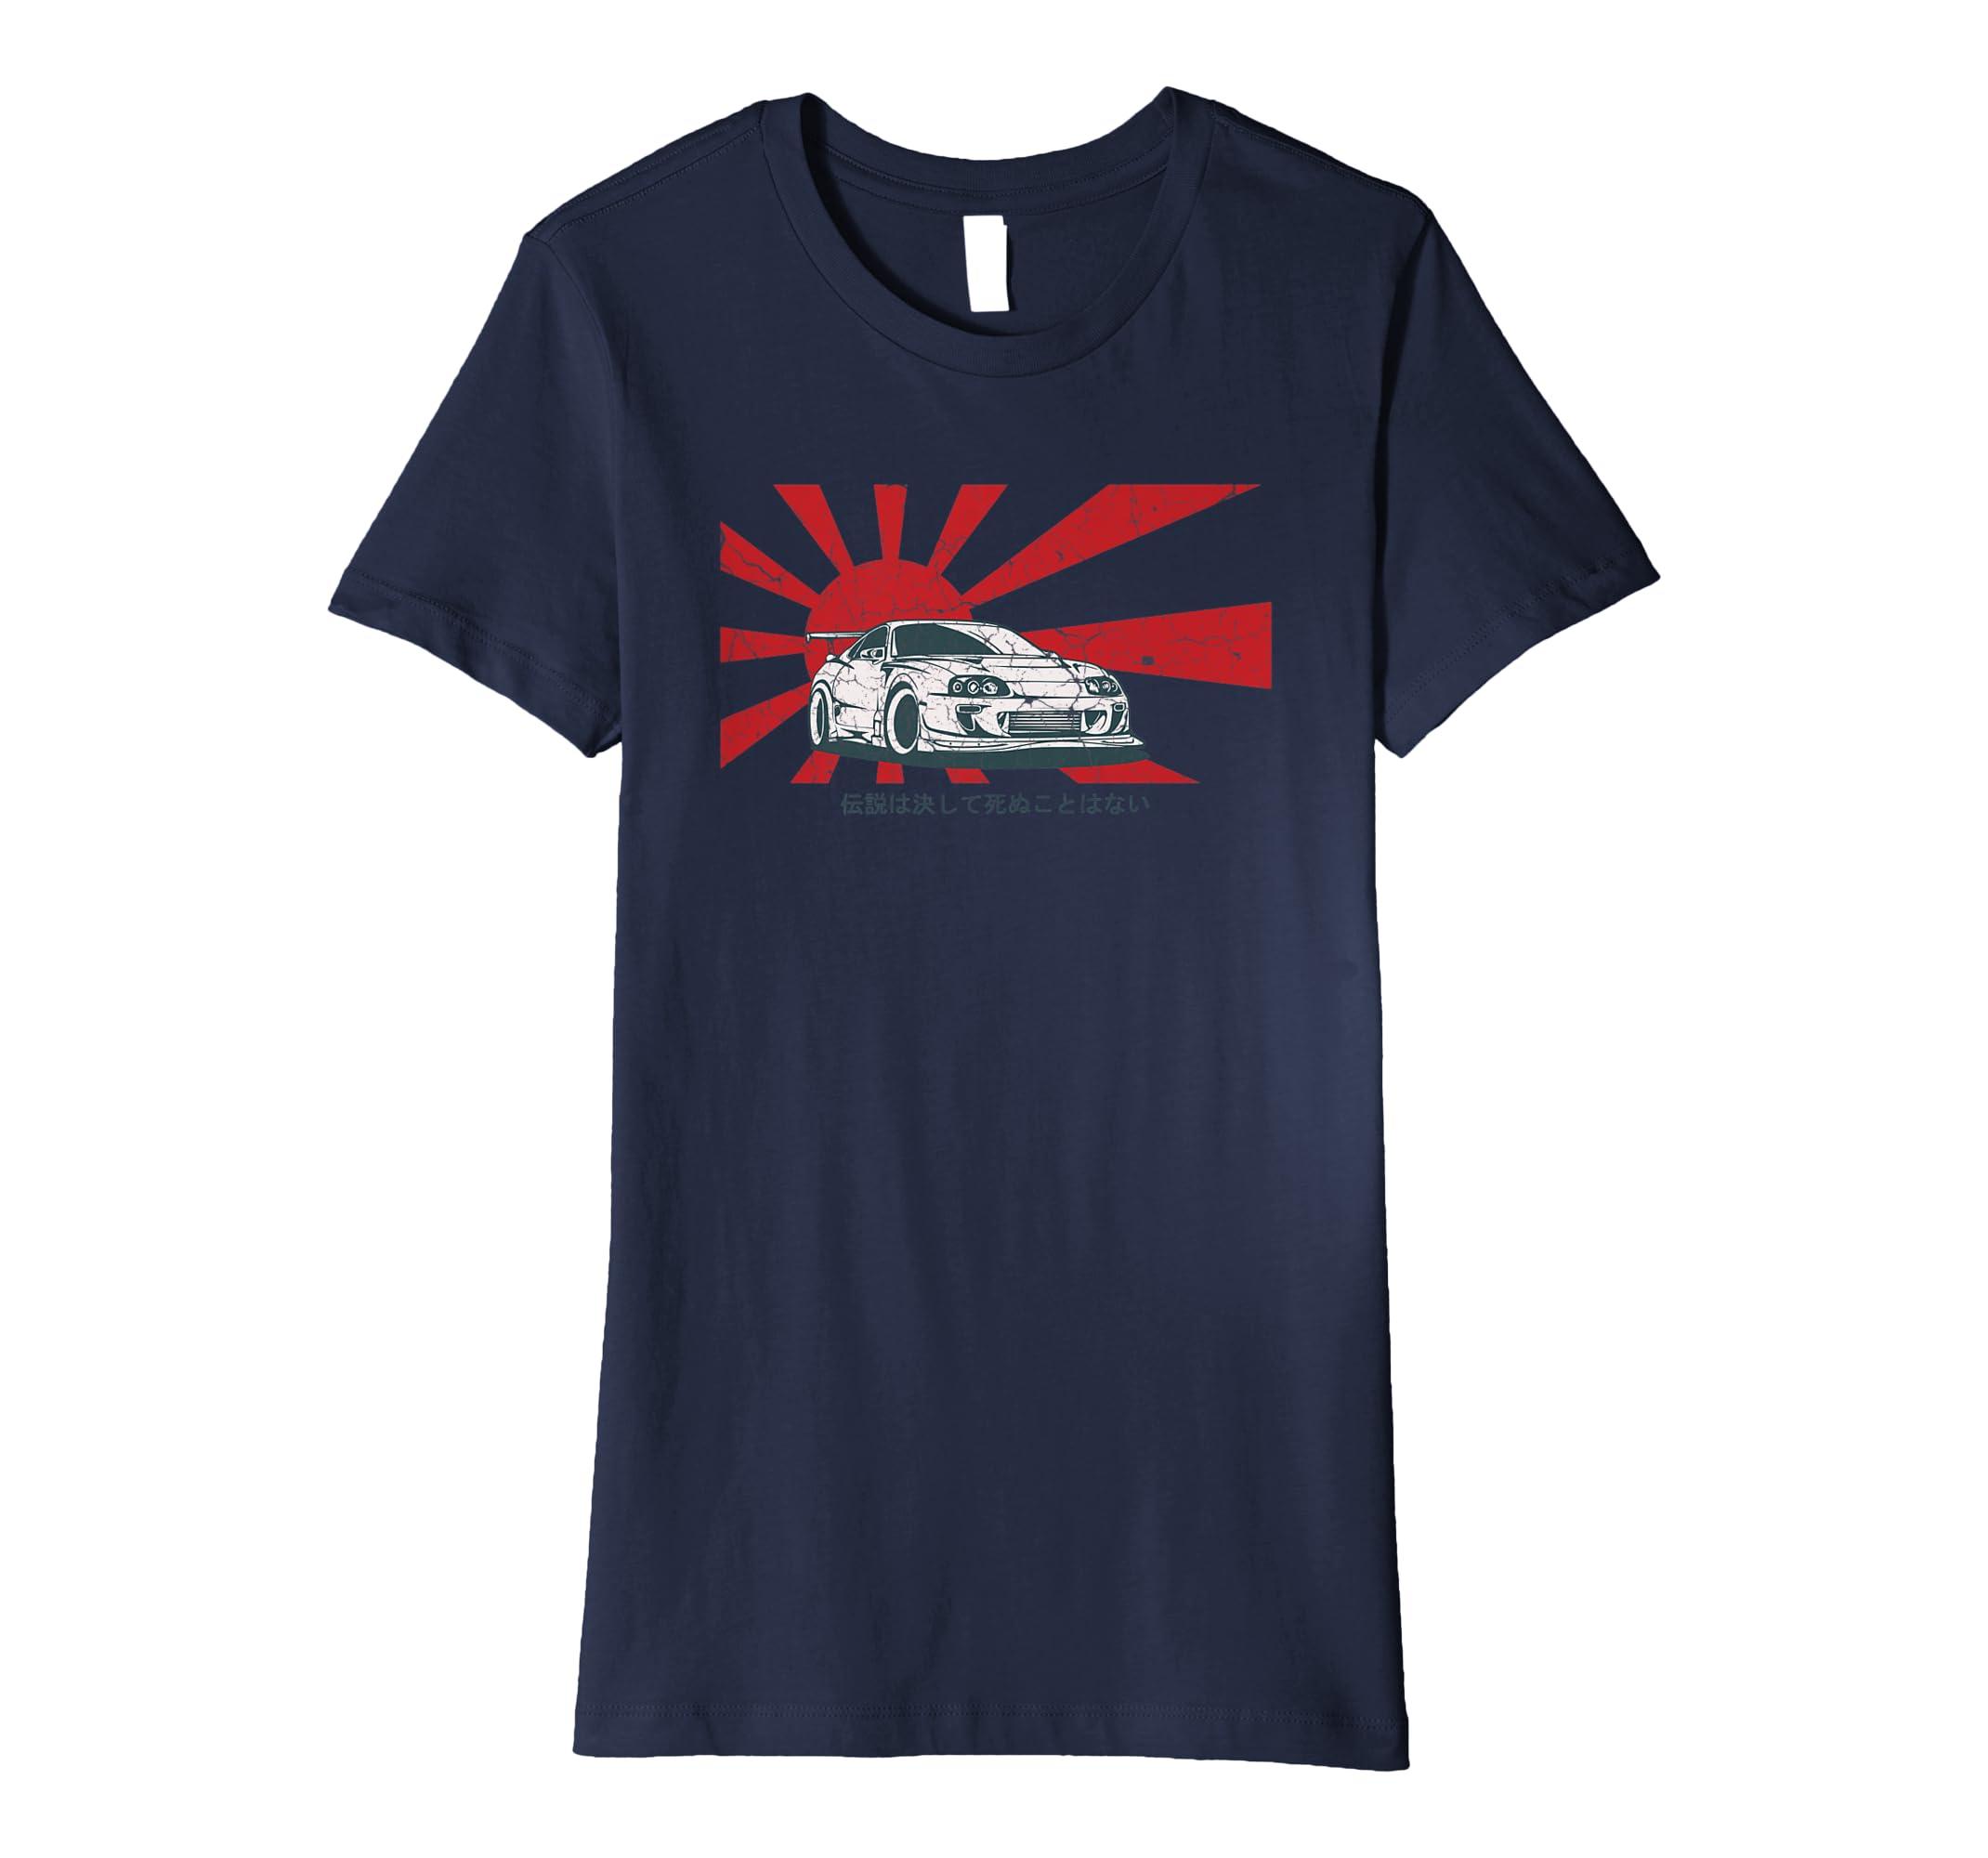 cbeb45bd92 Amazon.com: Automotive Apparel: Legends Never Die, JDM Street T-Shirt:  Clothing